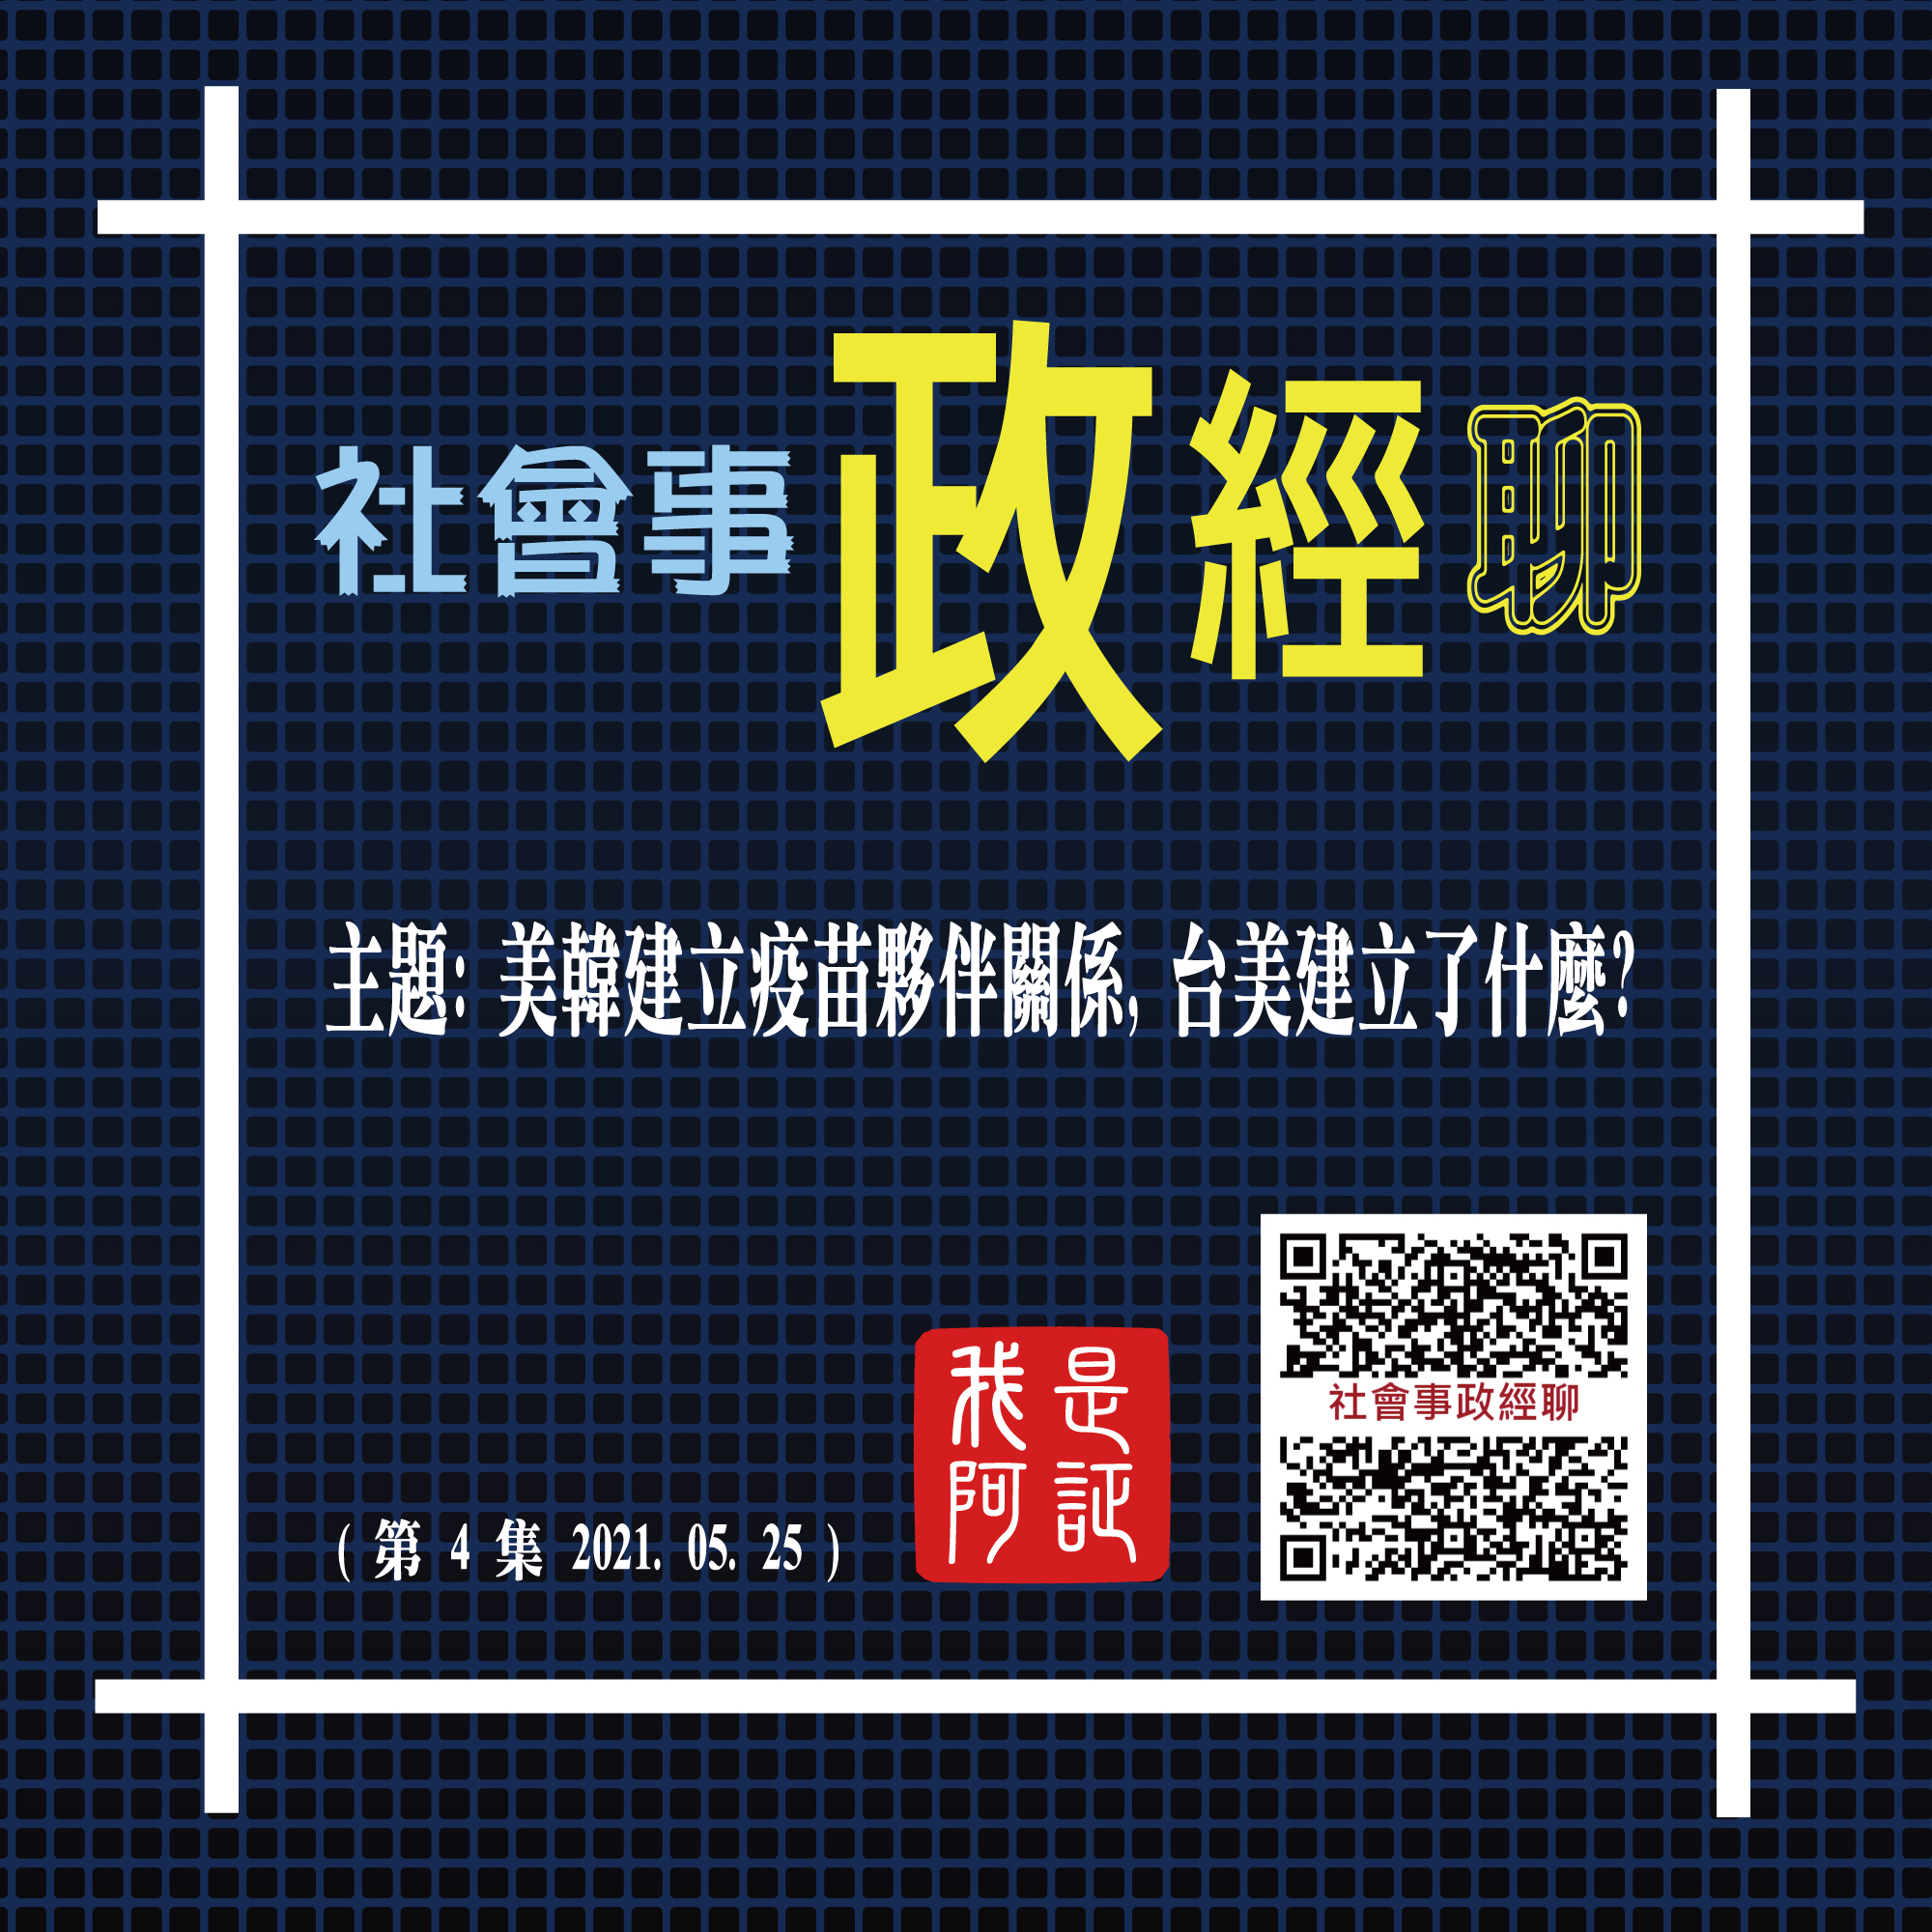 S1 EP004 l  主題:美韓建立疫苗夥伴關係,台美建立了什麼?  (20210525-社會事政經聊-第4集)